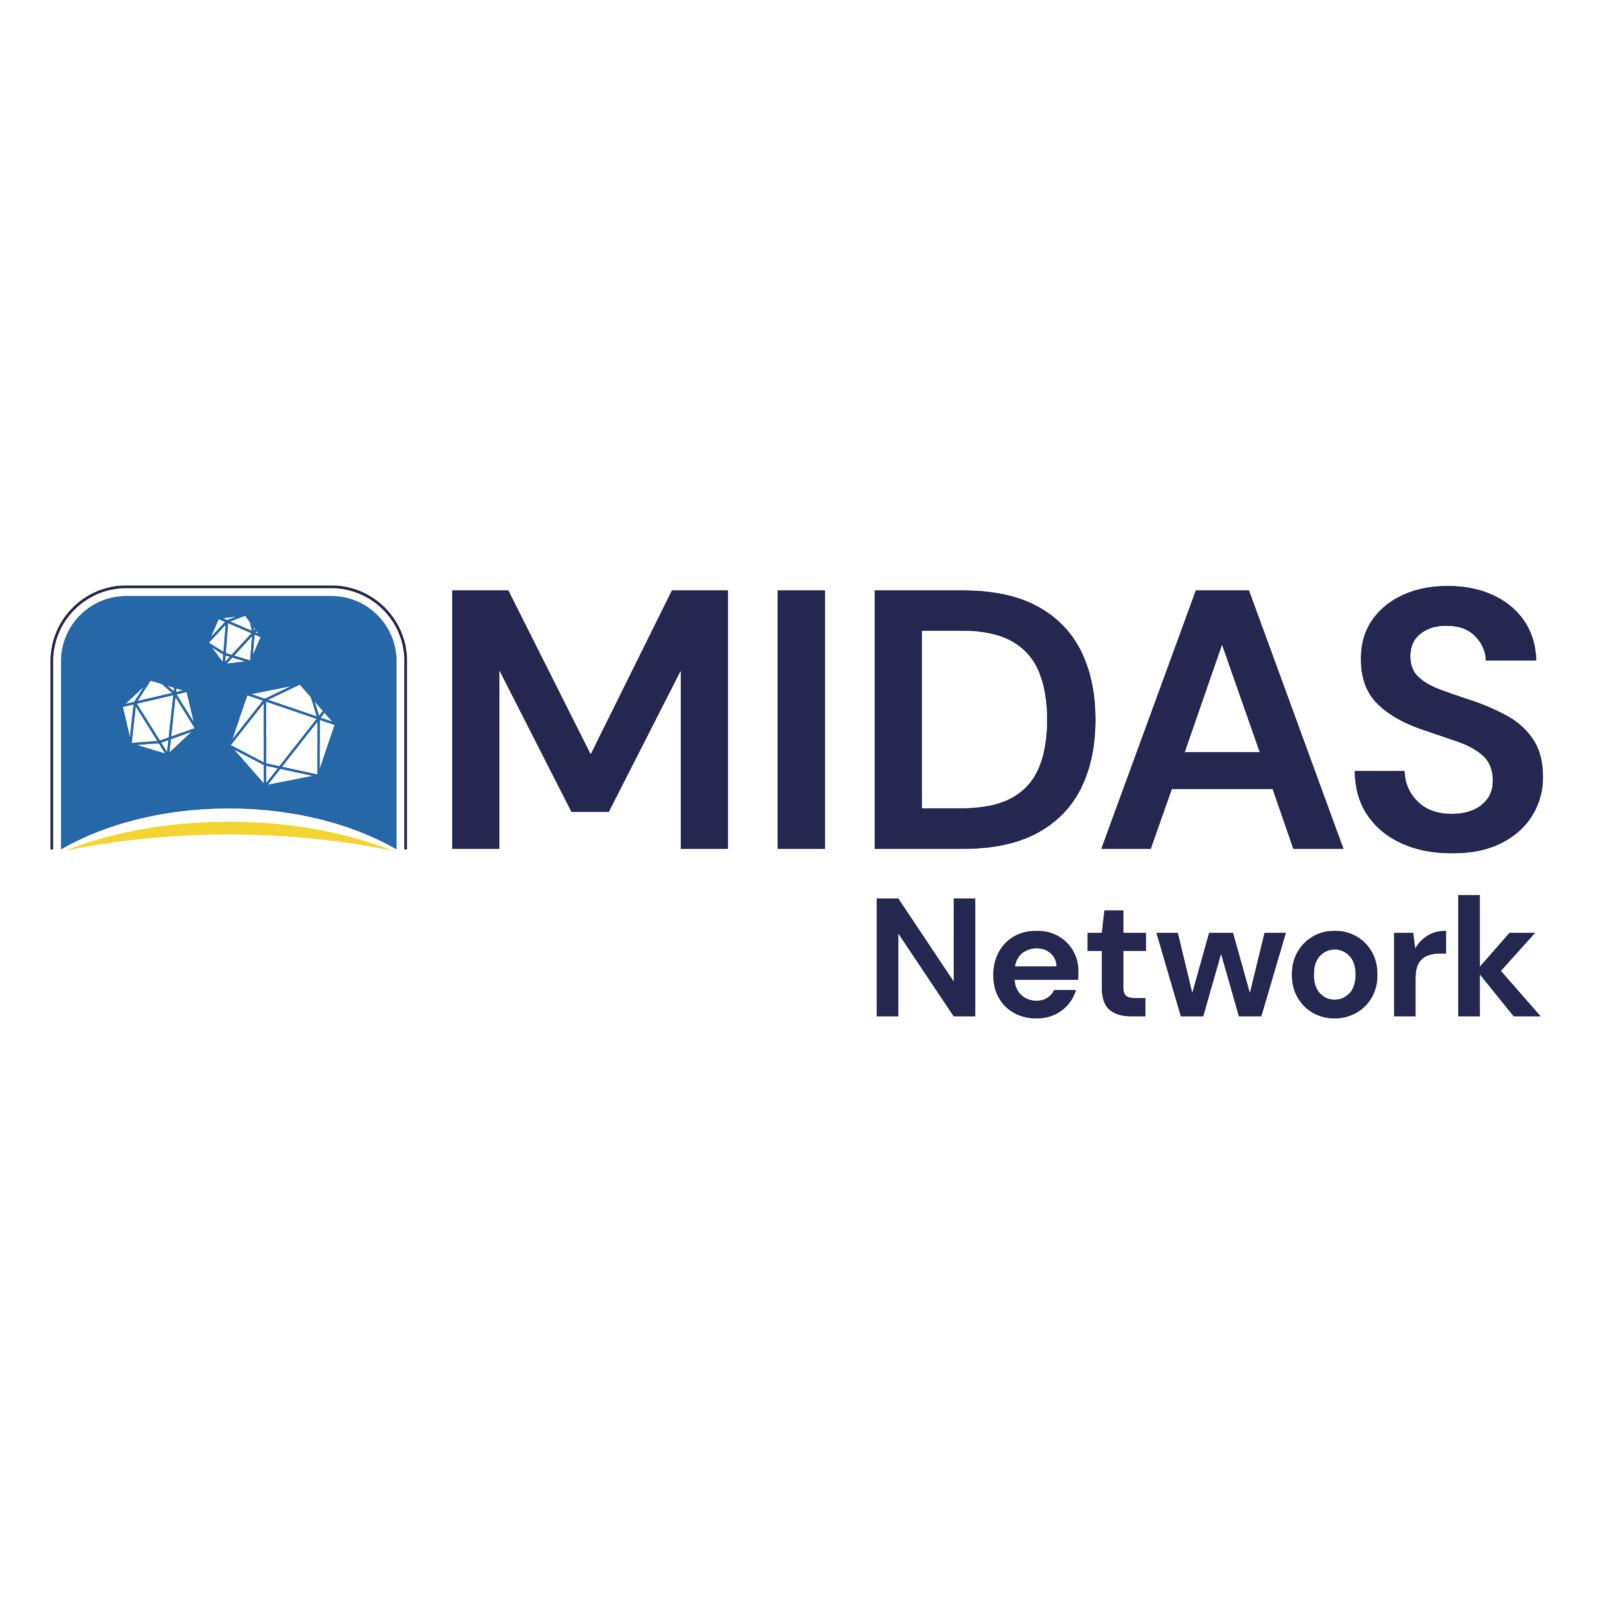 MIDAS network